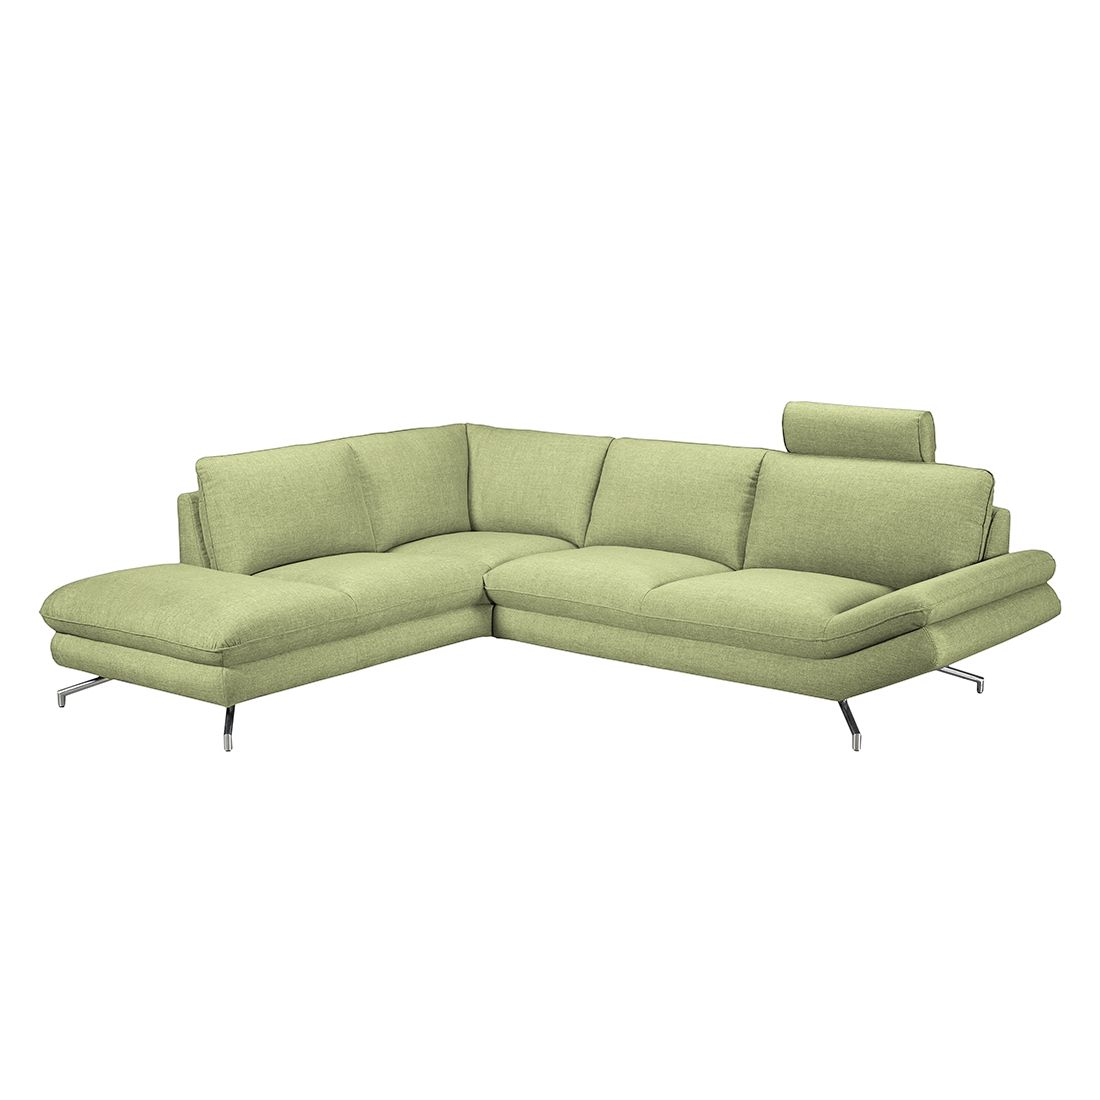 home24 loftscape Ecksofa Sharon 2,5-Sitzer Grün Webstoff 276x83x220 cm (BxHxT) Modern